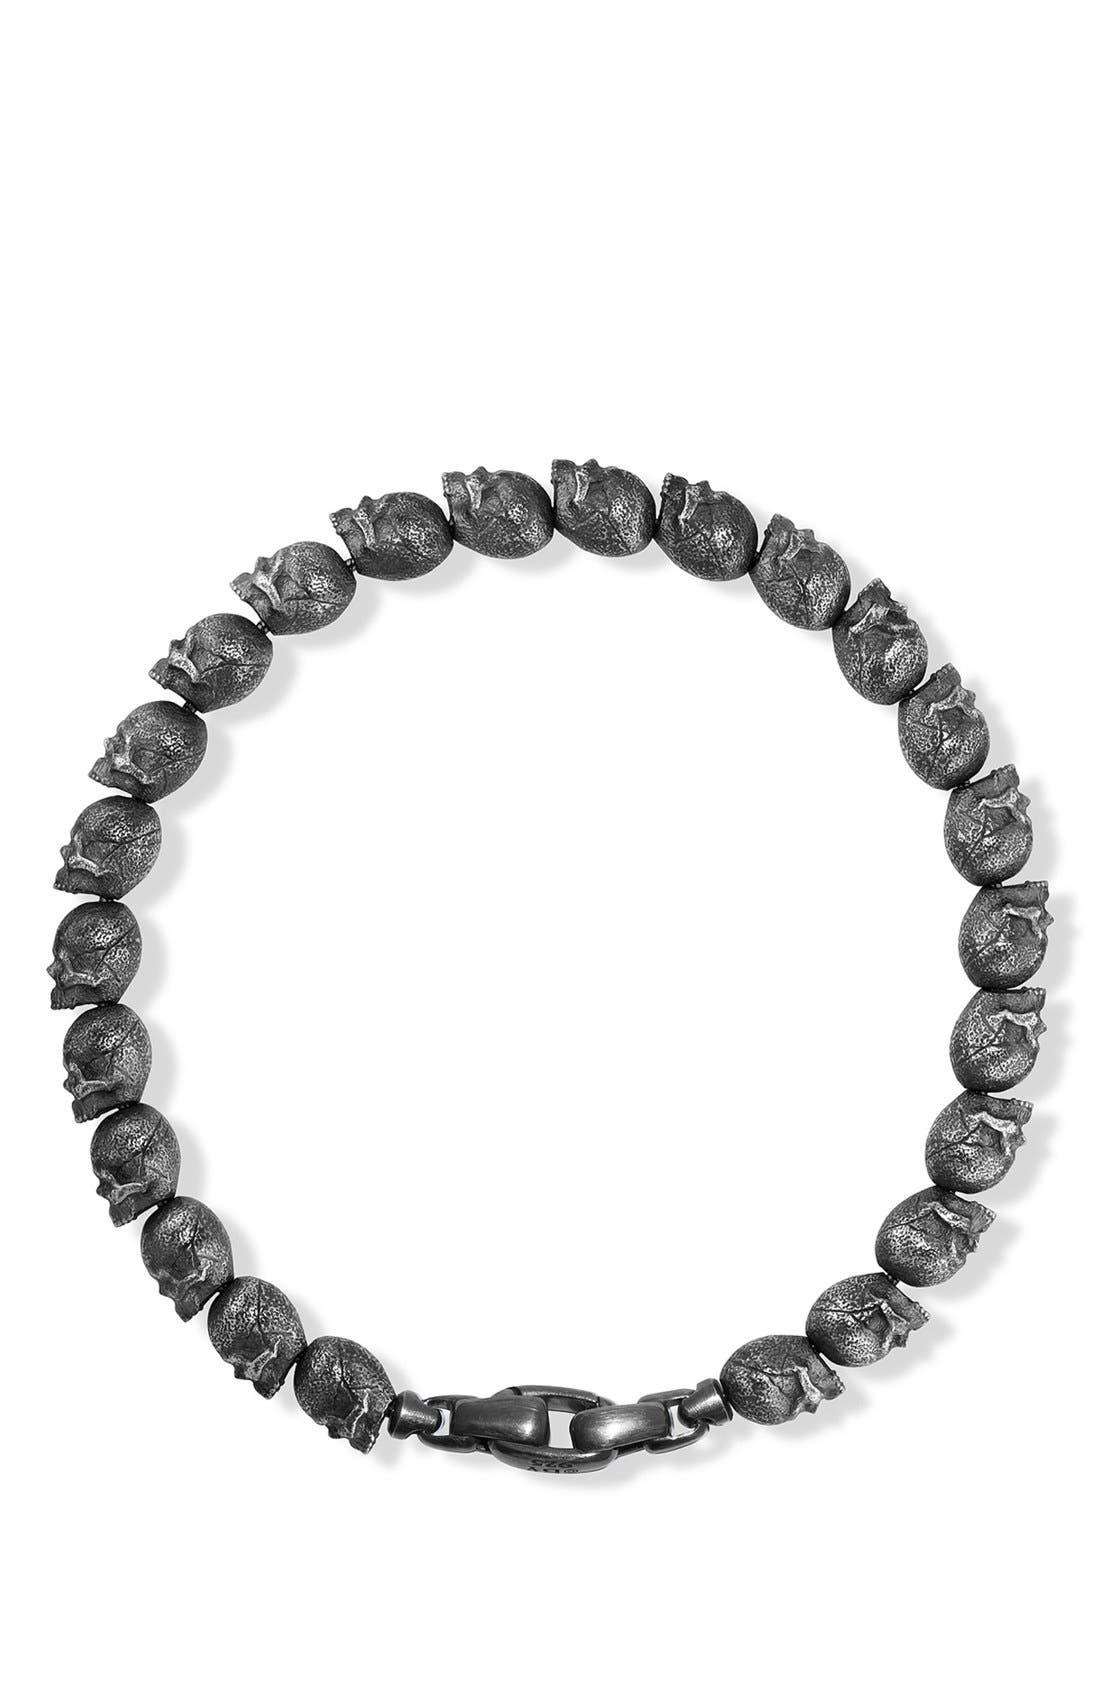 'Spiritual Beads' Bracelet in Silver,                             Alternate thumbnail 3, color,                             040